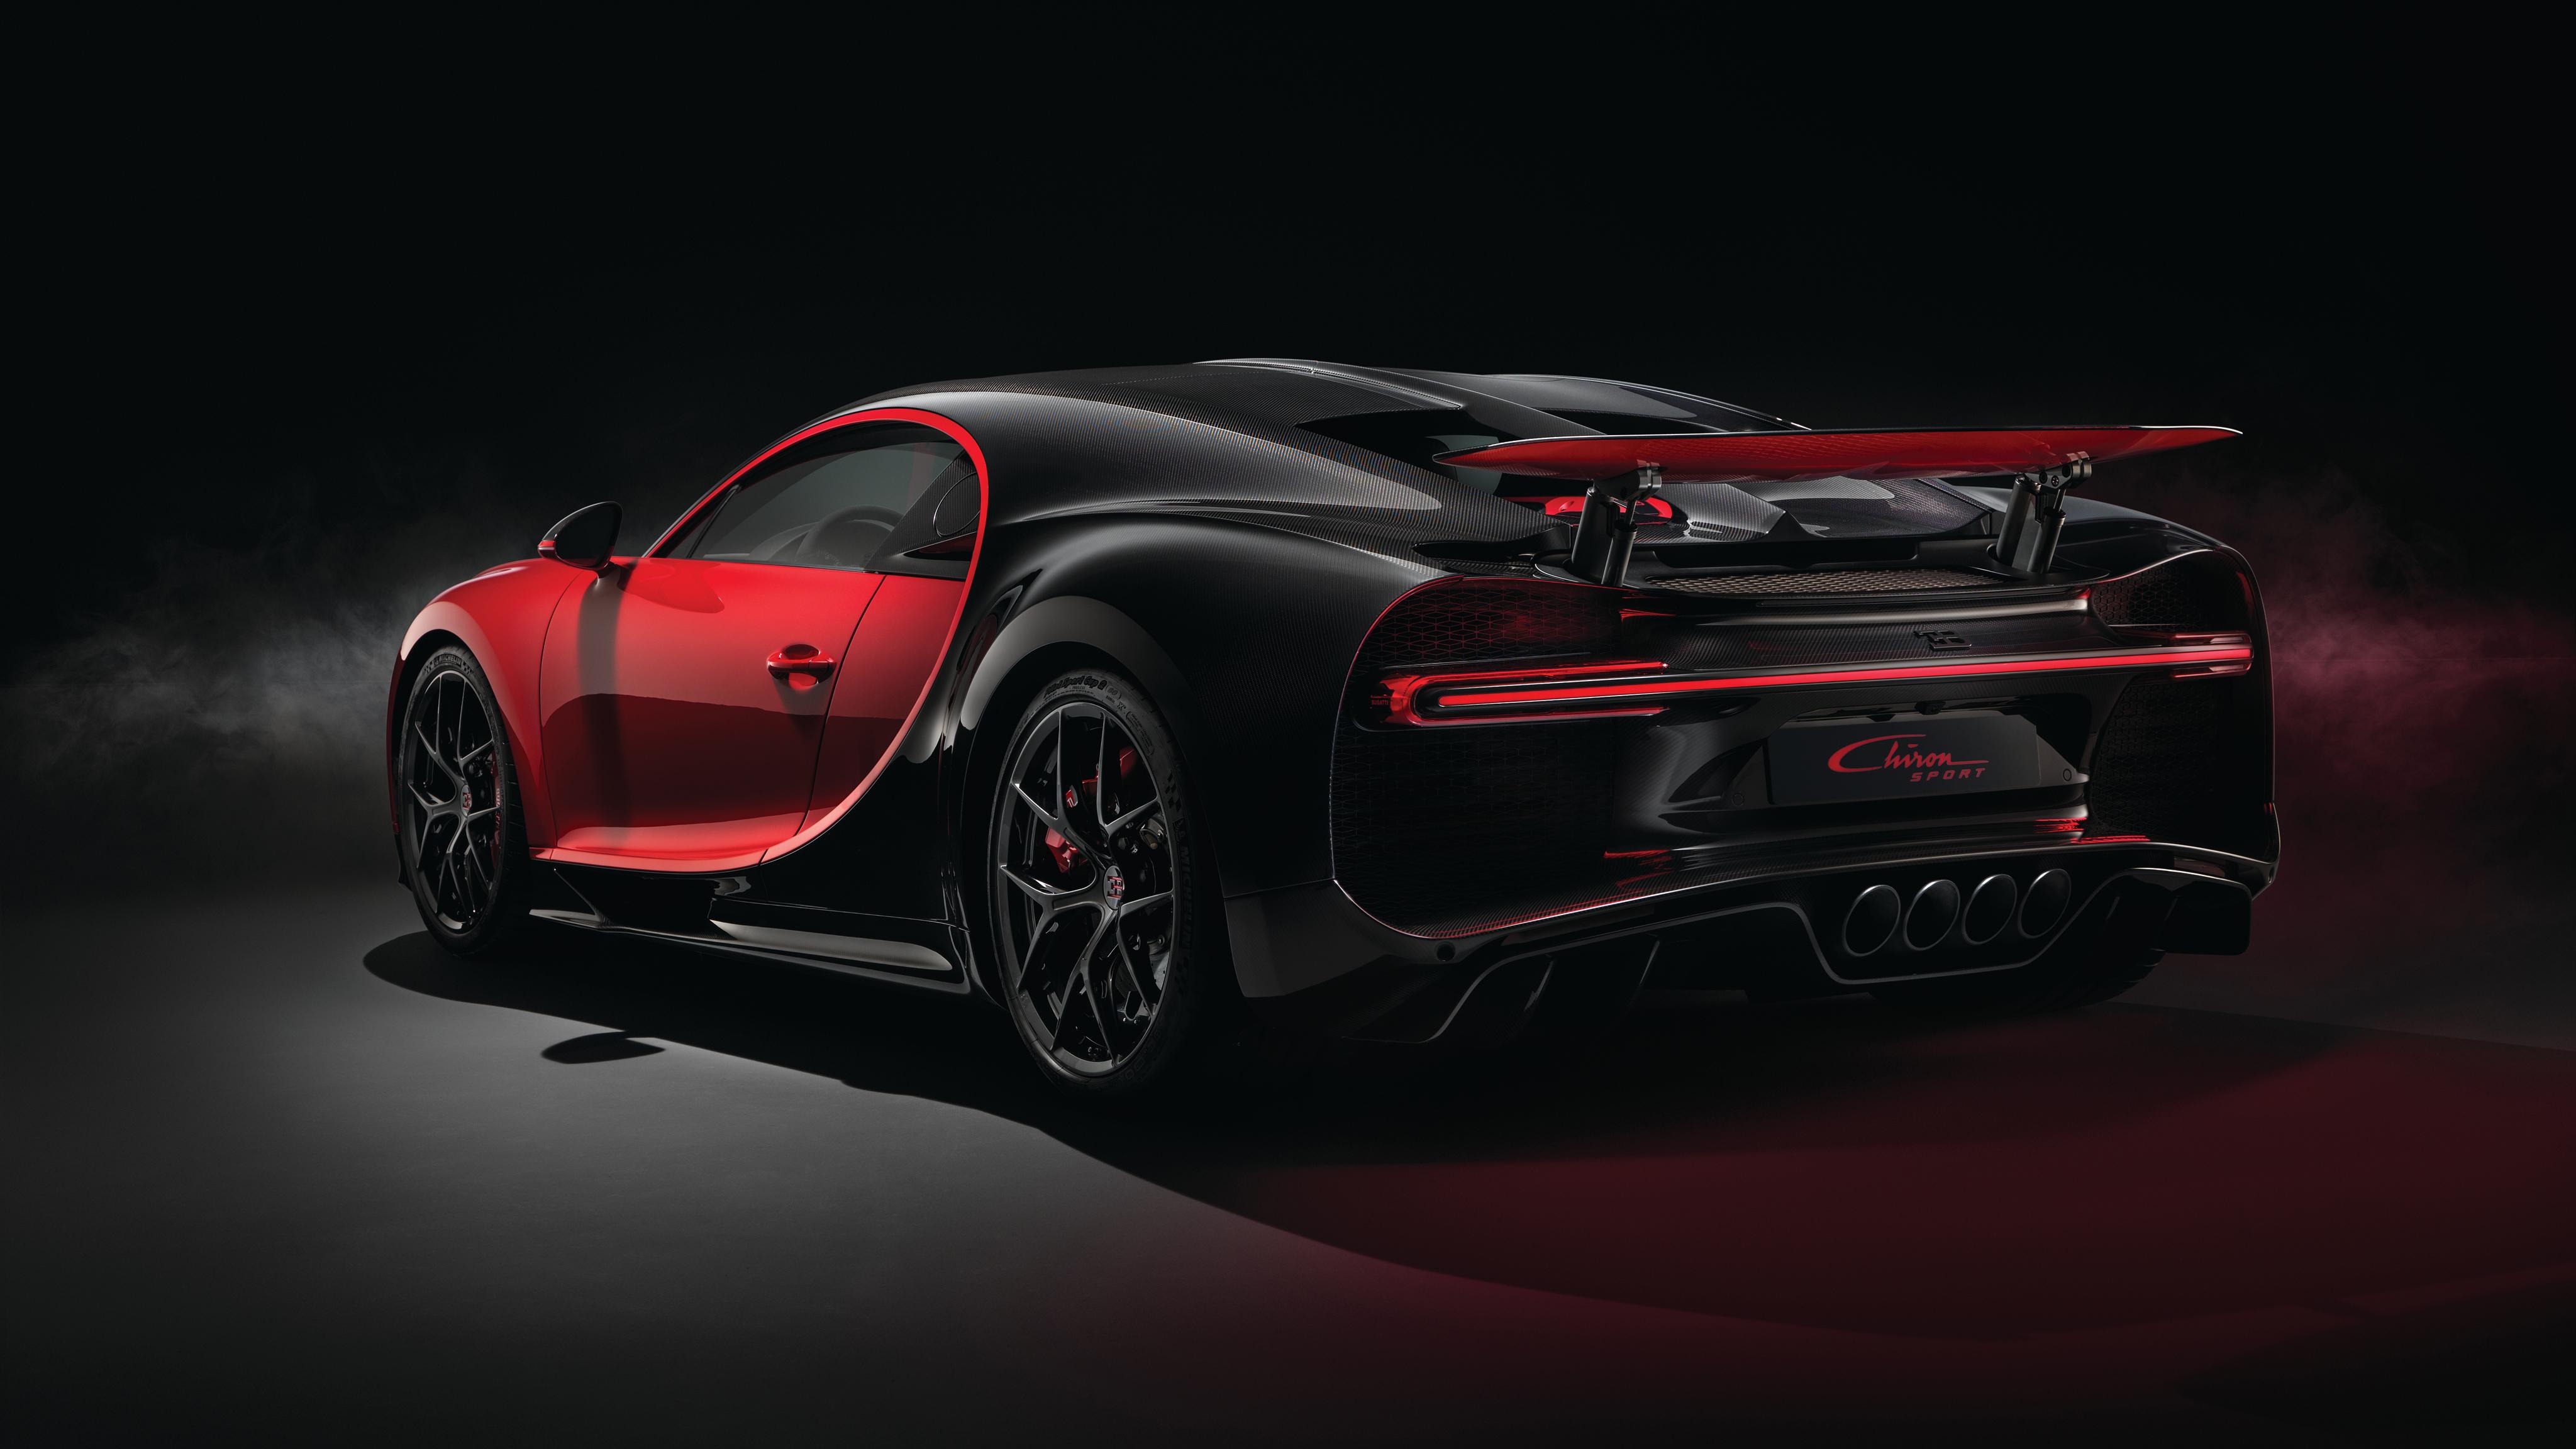 bugatti chiron speed side view 4k hd. Download Bugatti Chiron Wallpaper Hd For Android Pics Picture Idokeren